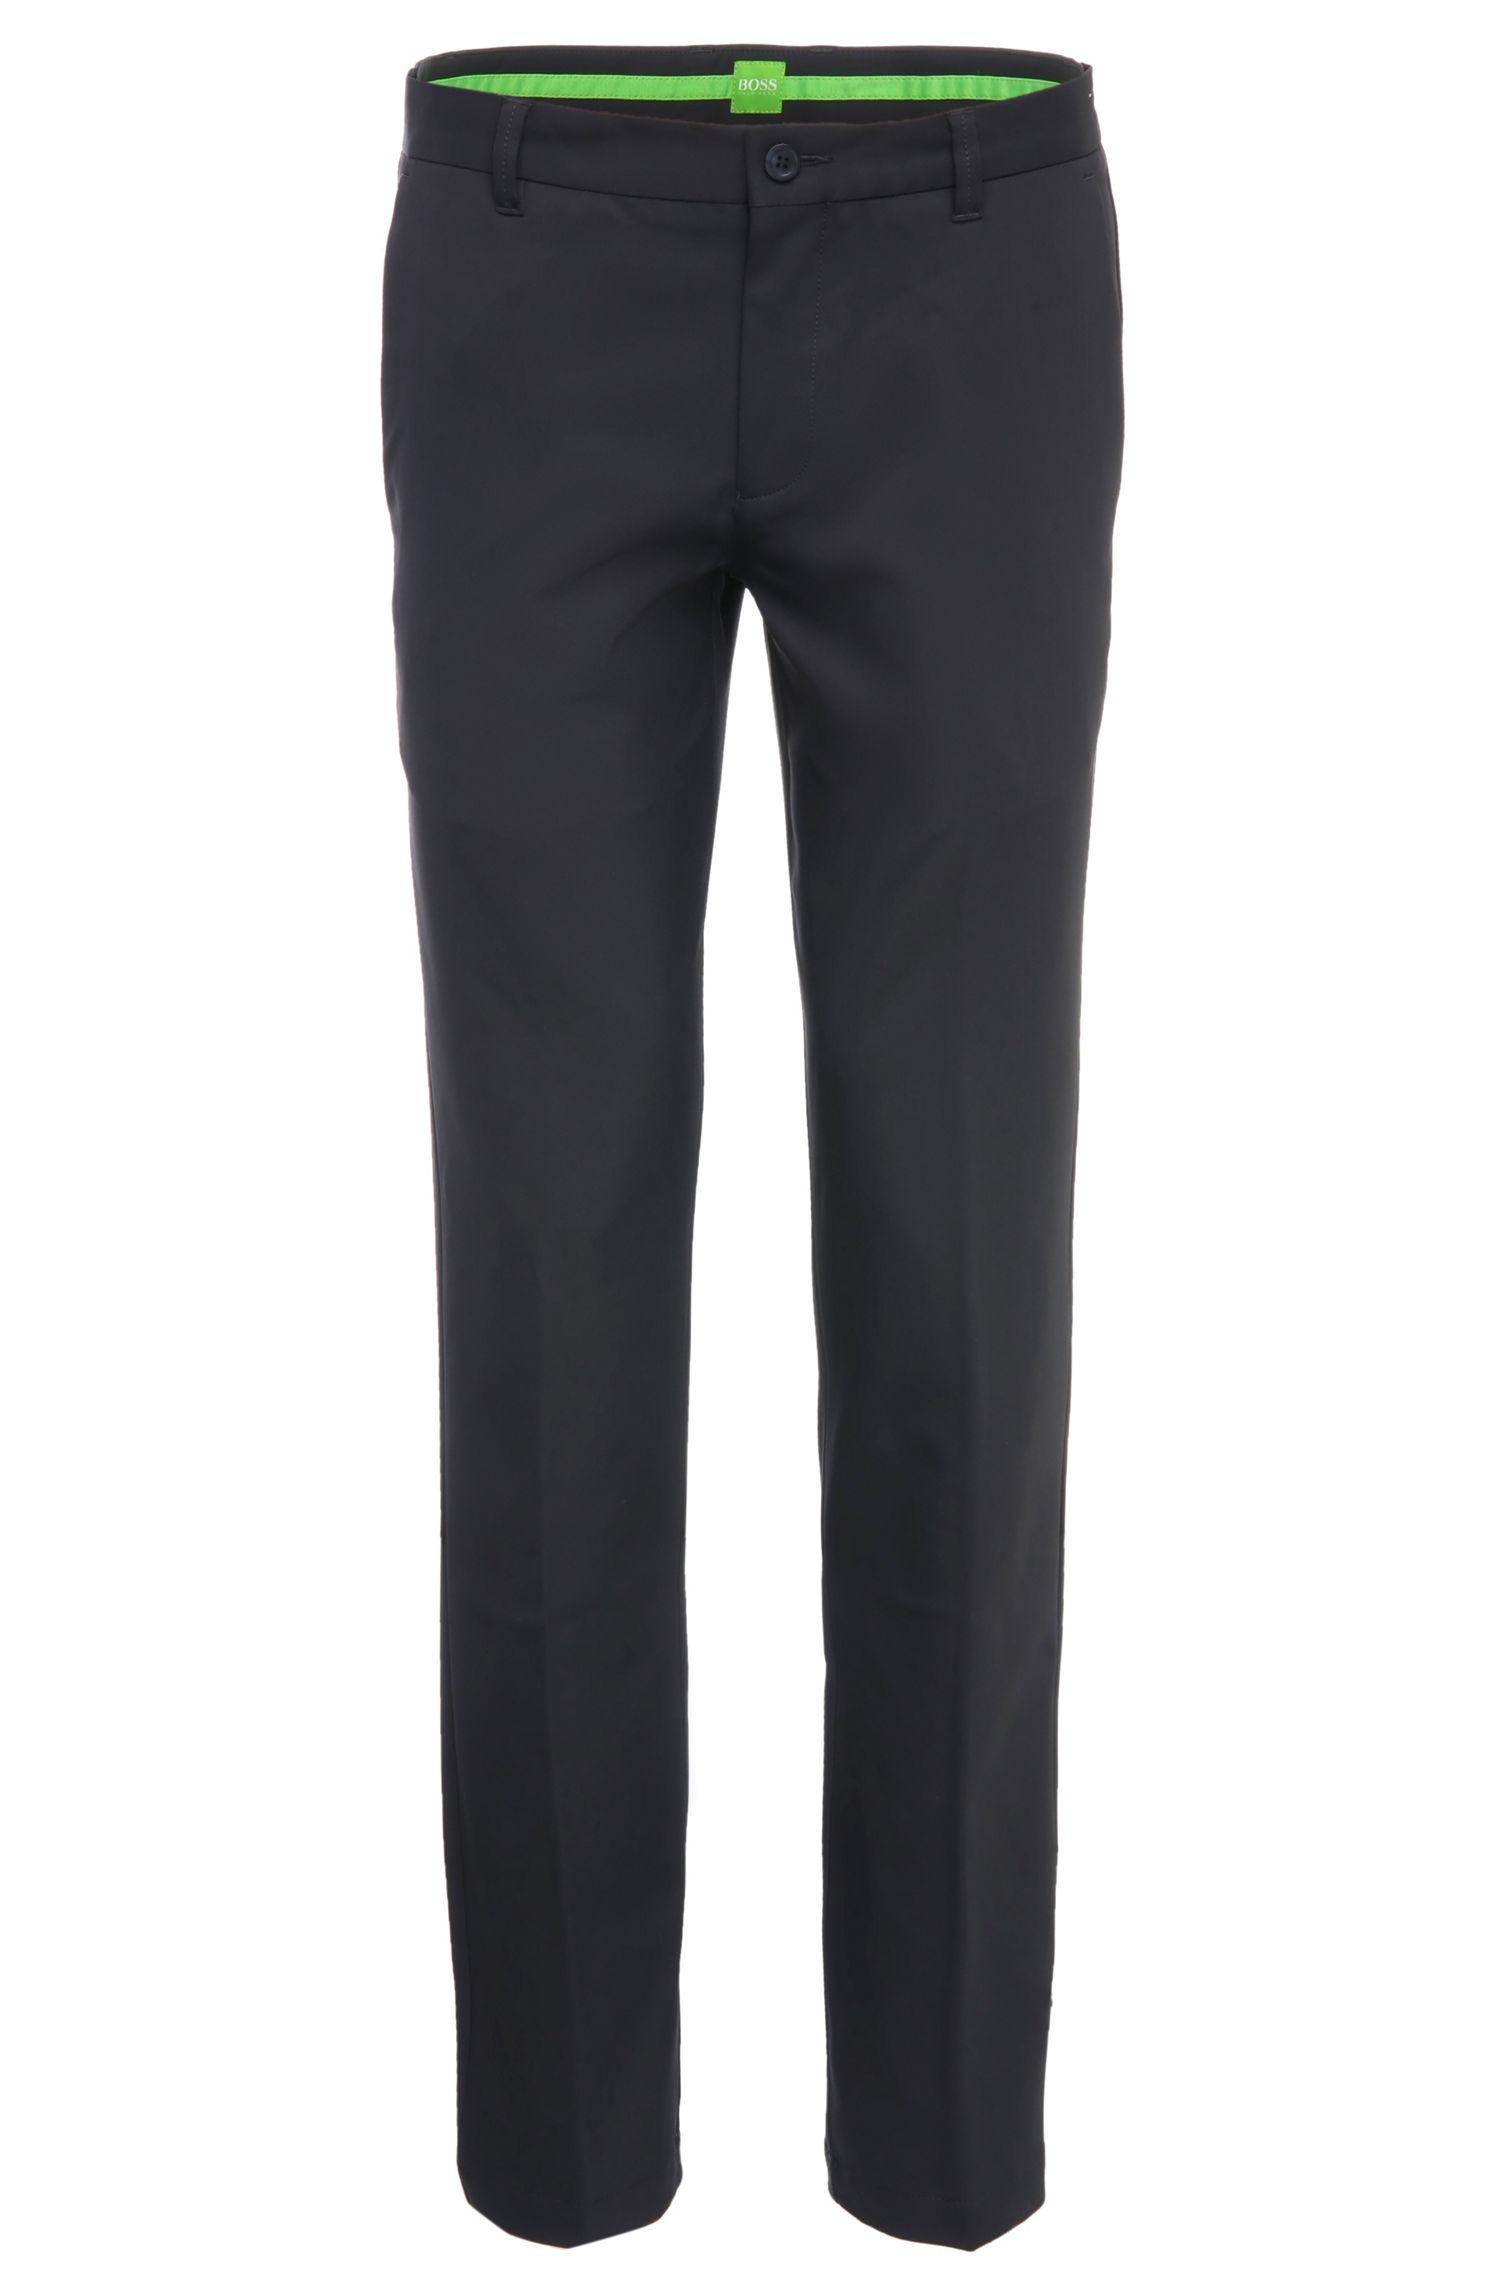 'Hakan-Slim' | Slim Fit, CoolMax Performance Golf Pants